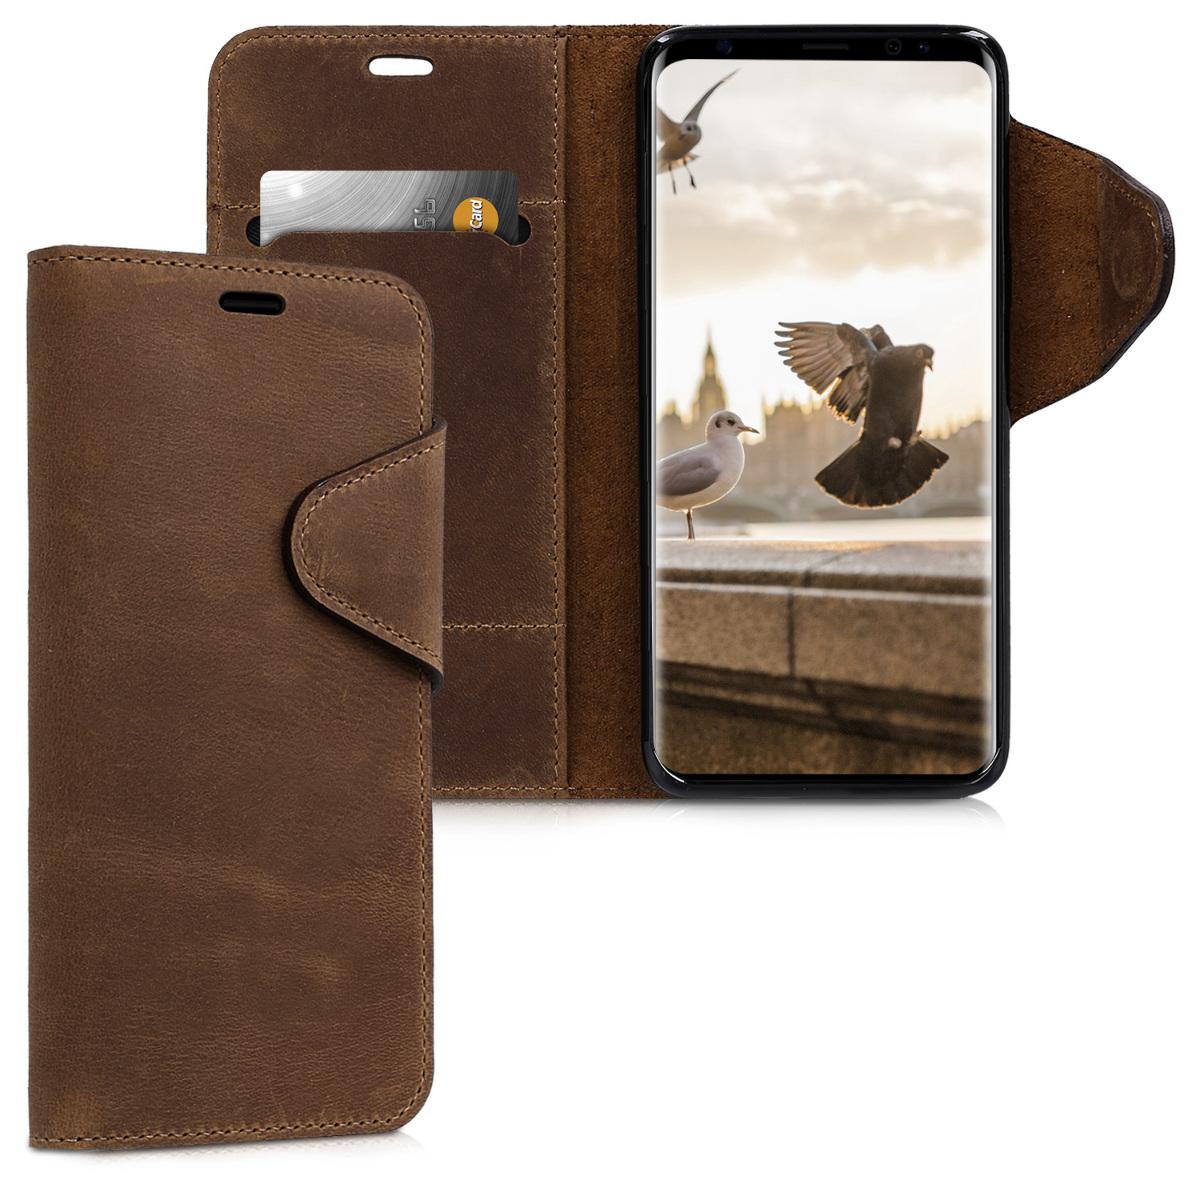 Kalibri Δερμάτινη Suede Θήκη - Πορτοφόλι  Samsung Galaxy S9 - Brown (44192.05)